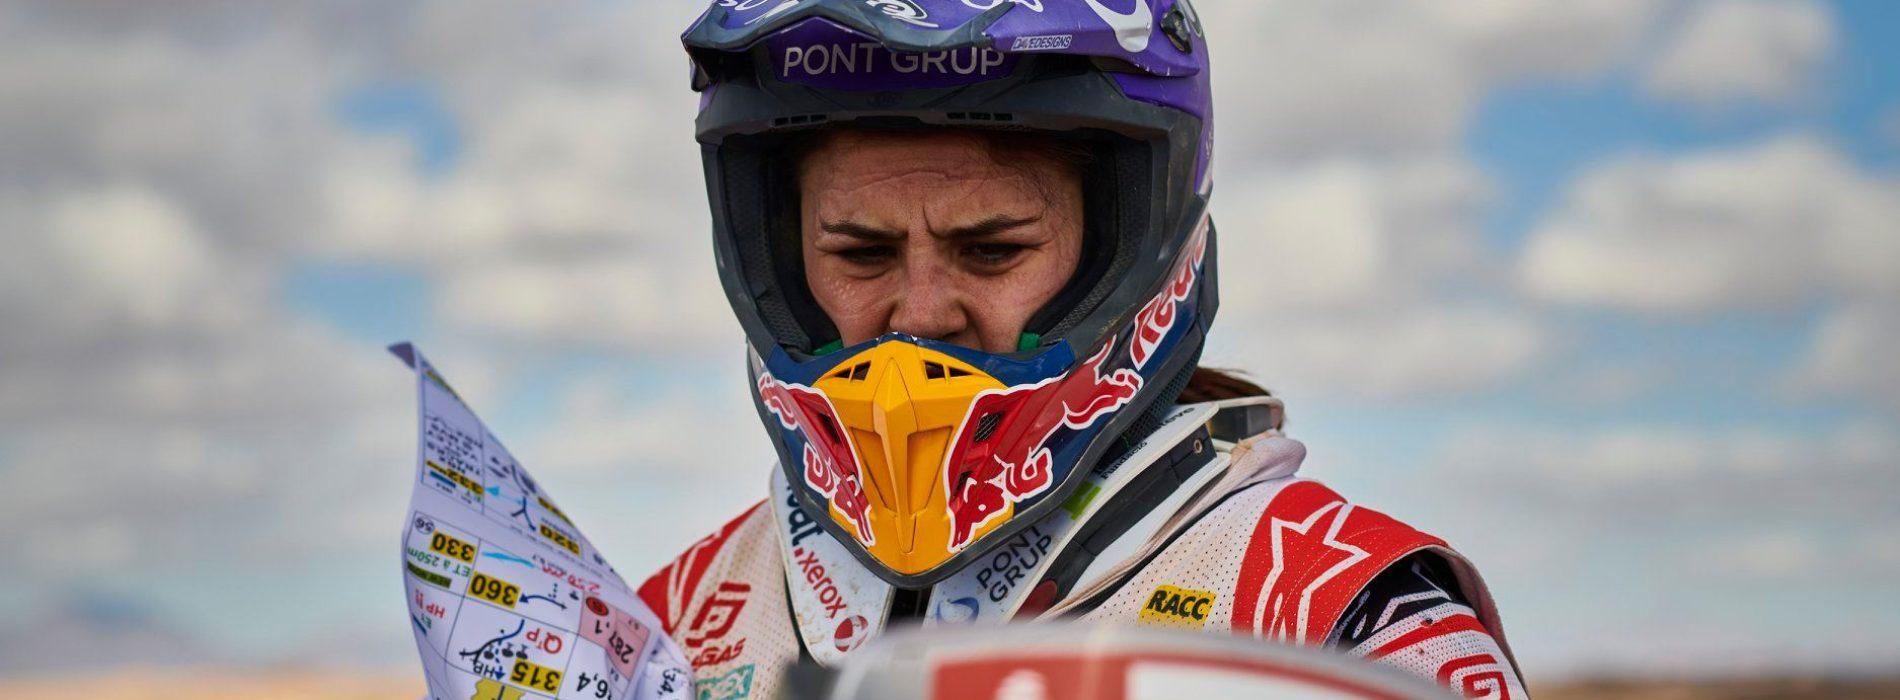 Women Motorsport season 2020- one heck of full schedule!